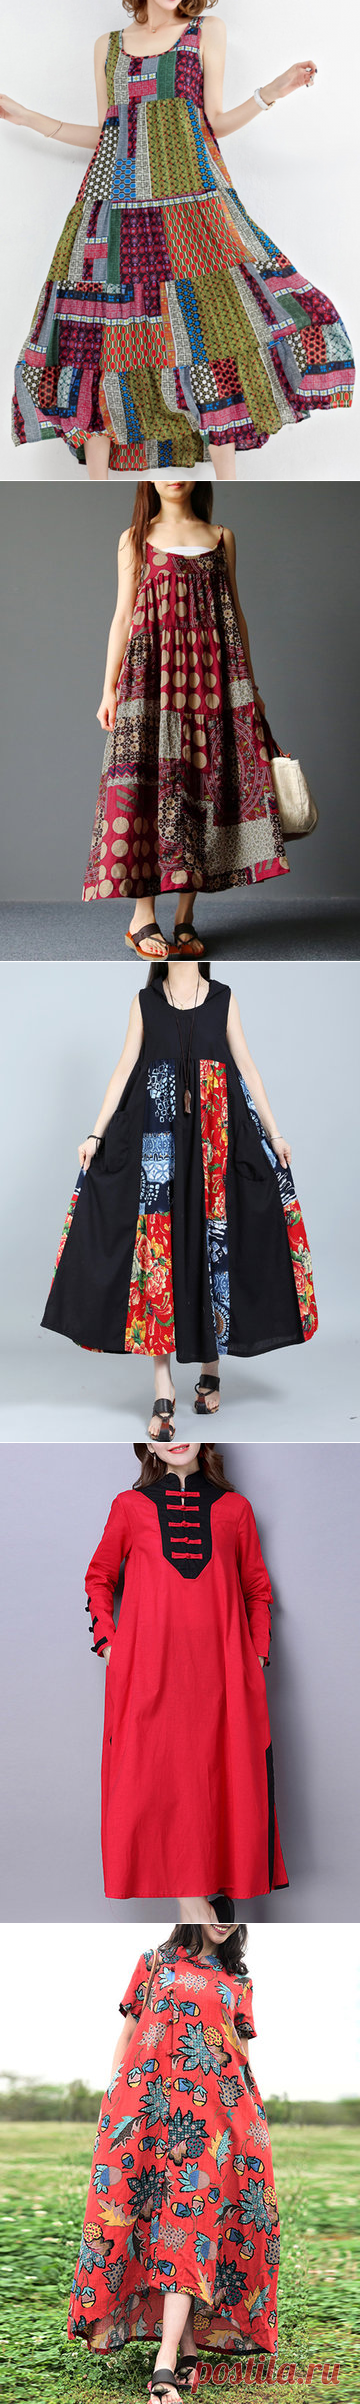 Gracila Bohemian Patchwork Sleeveless O-Neck Long Maxi Dresses Shopping Online - NewChic